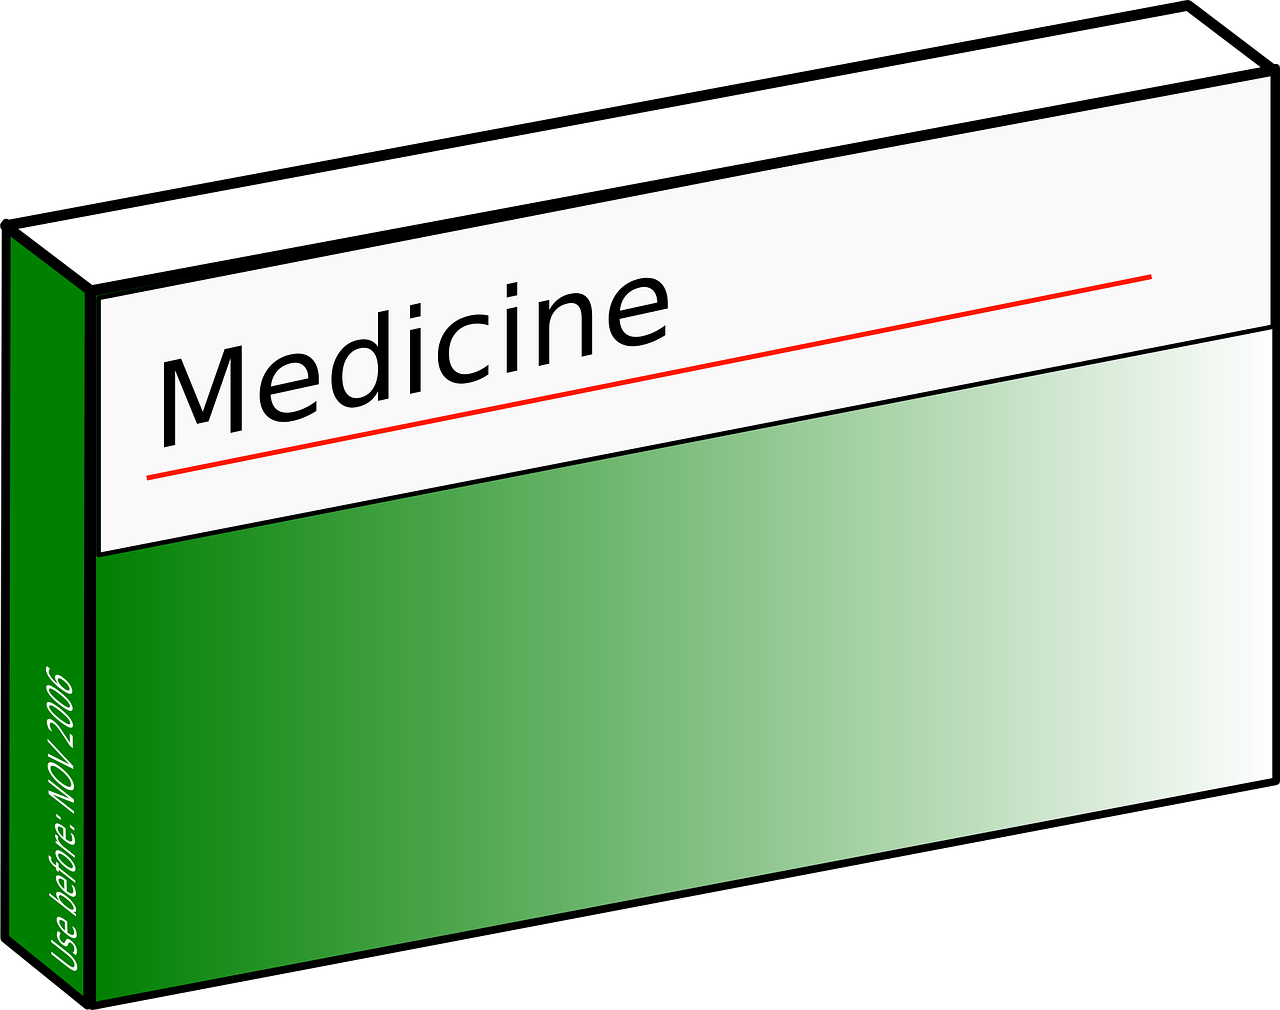 Pills clipart medicine box Domain Clip to Medicine Art